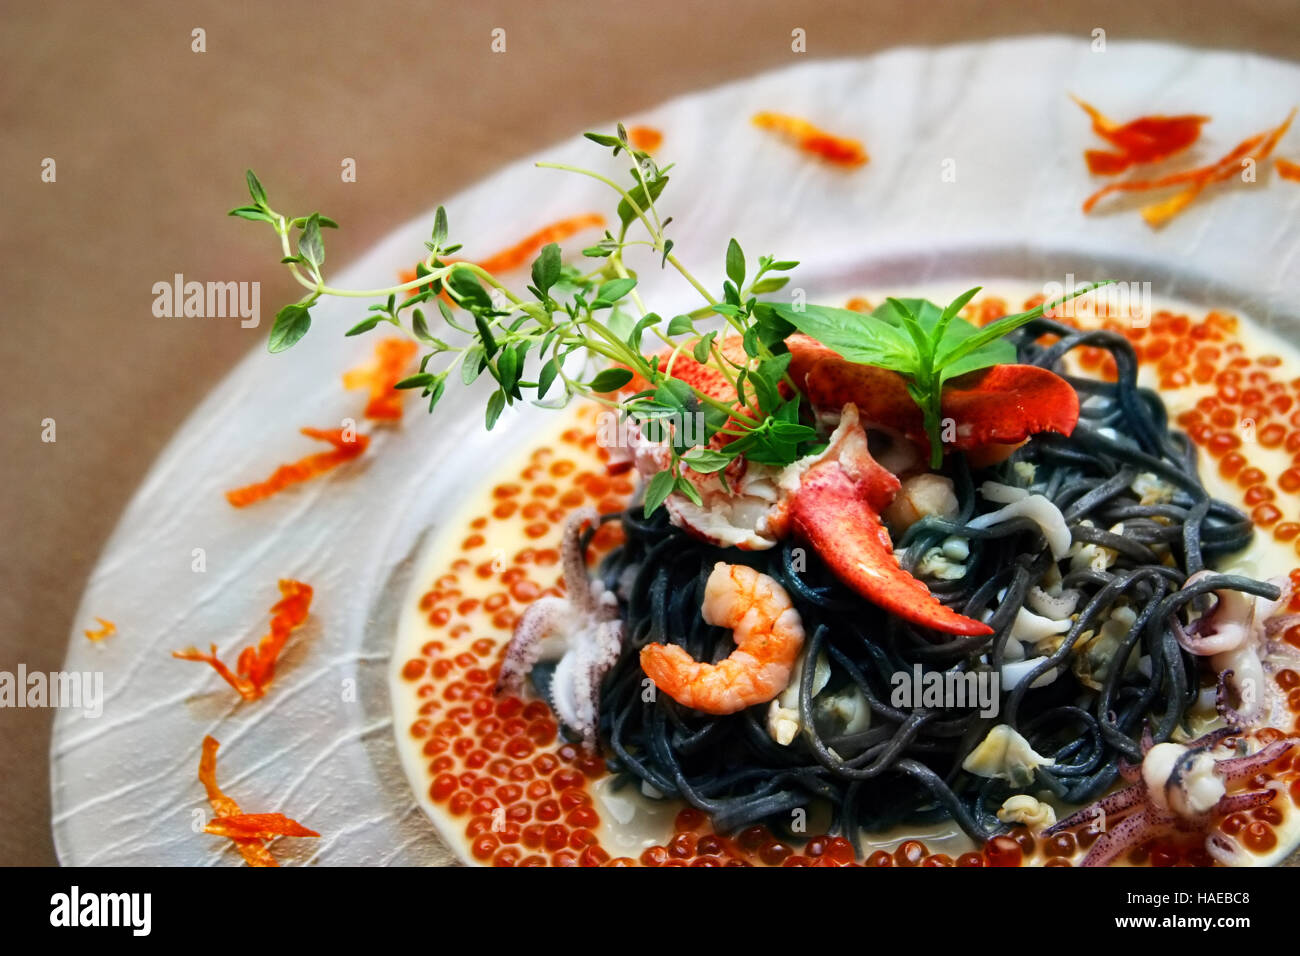 schwarze nudeln mit hummer sahne sauce und kaviar stockfoto bild 126935432 alamy. Black Bedroom Furniture Sets. Home Design Ideas